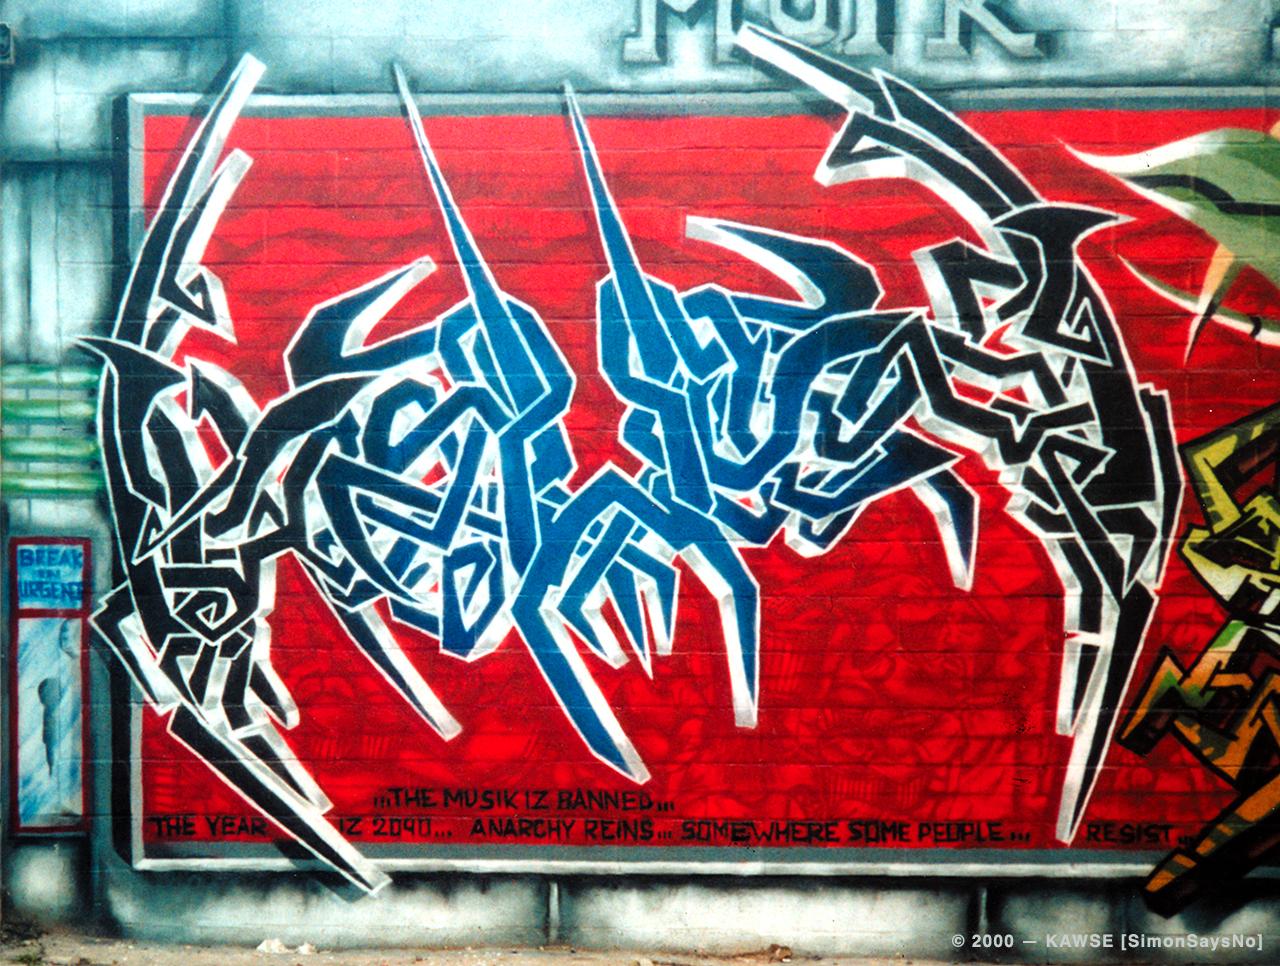 KAWSE 2000 —  WILD STYLER [Graffiti]